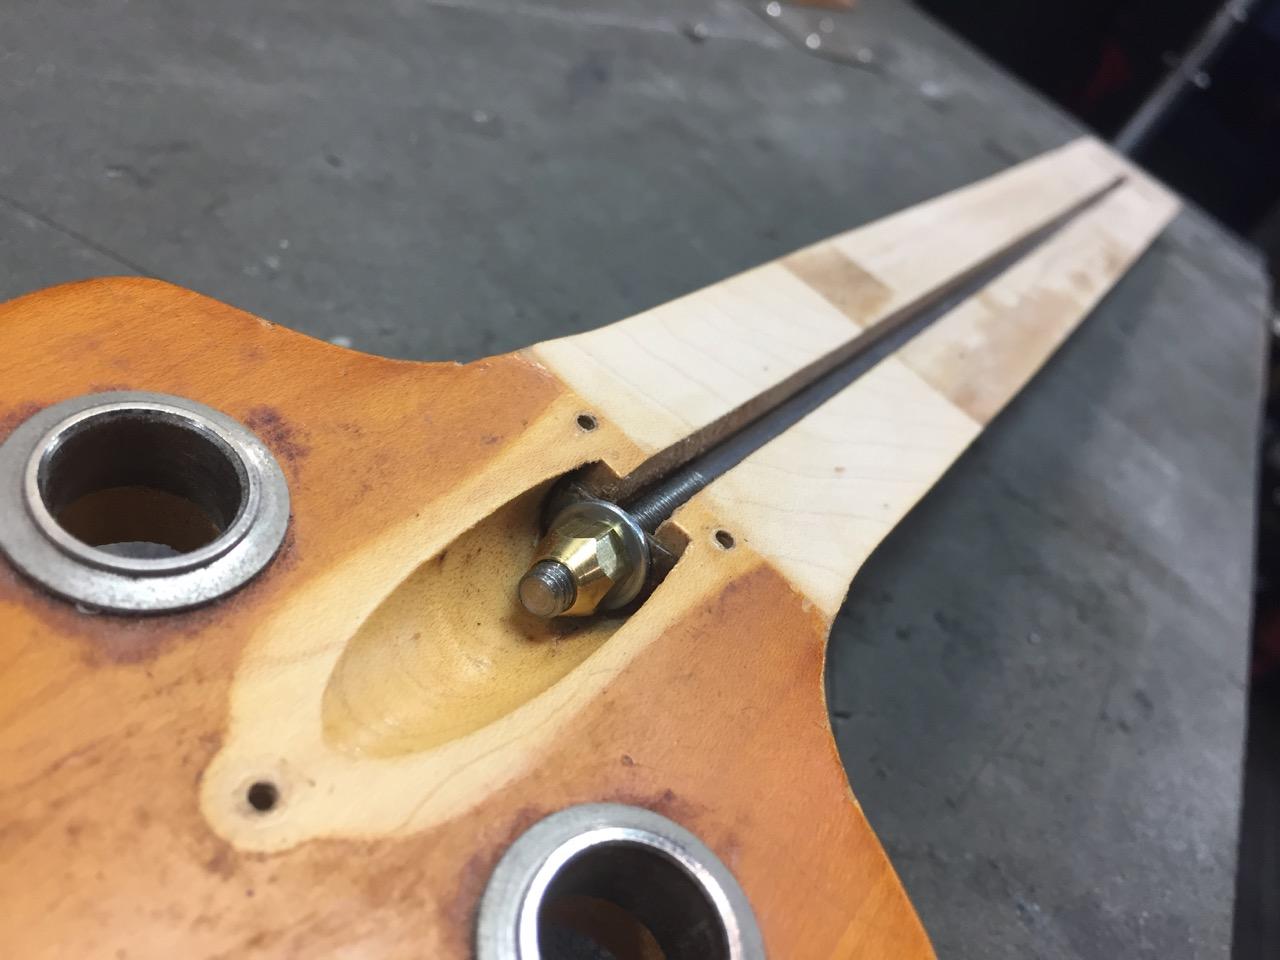 Fixing a broken Gibson truss rod on a vintage Grabber